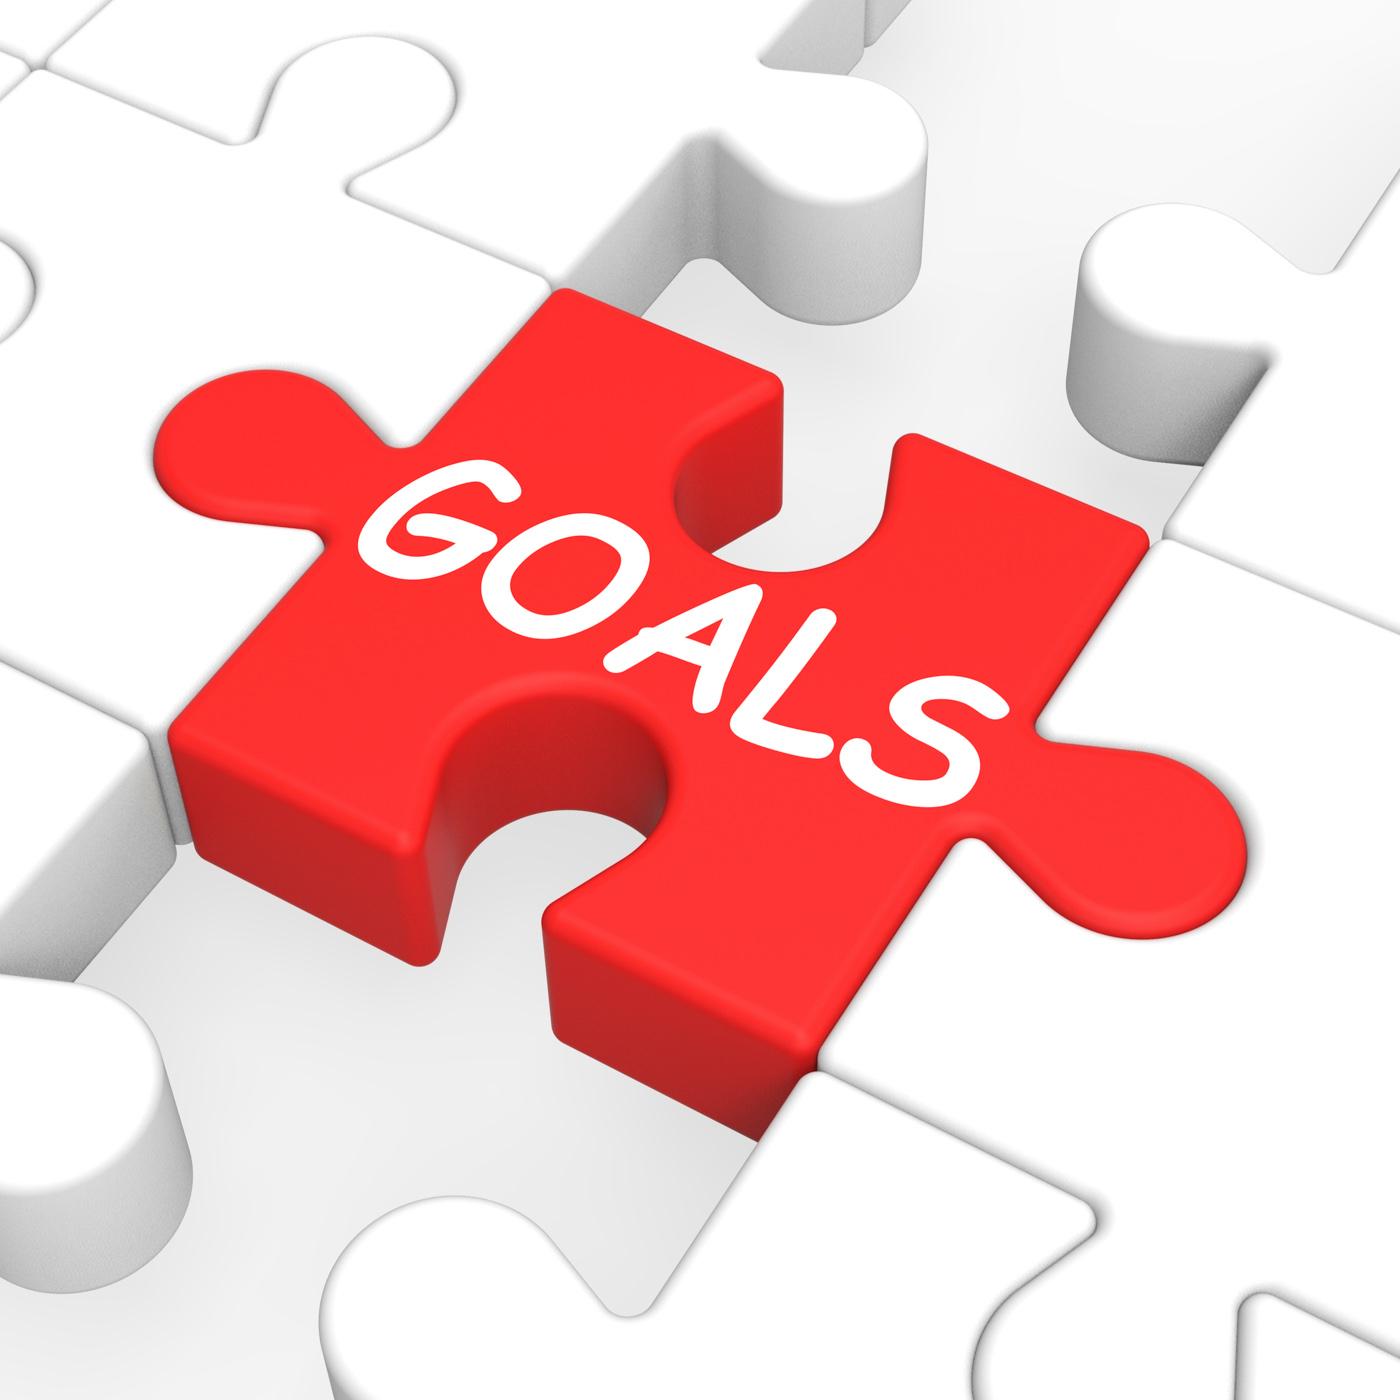 Goals puzzle showing aspiration targets photo